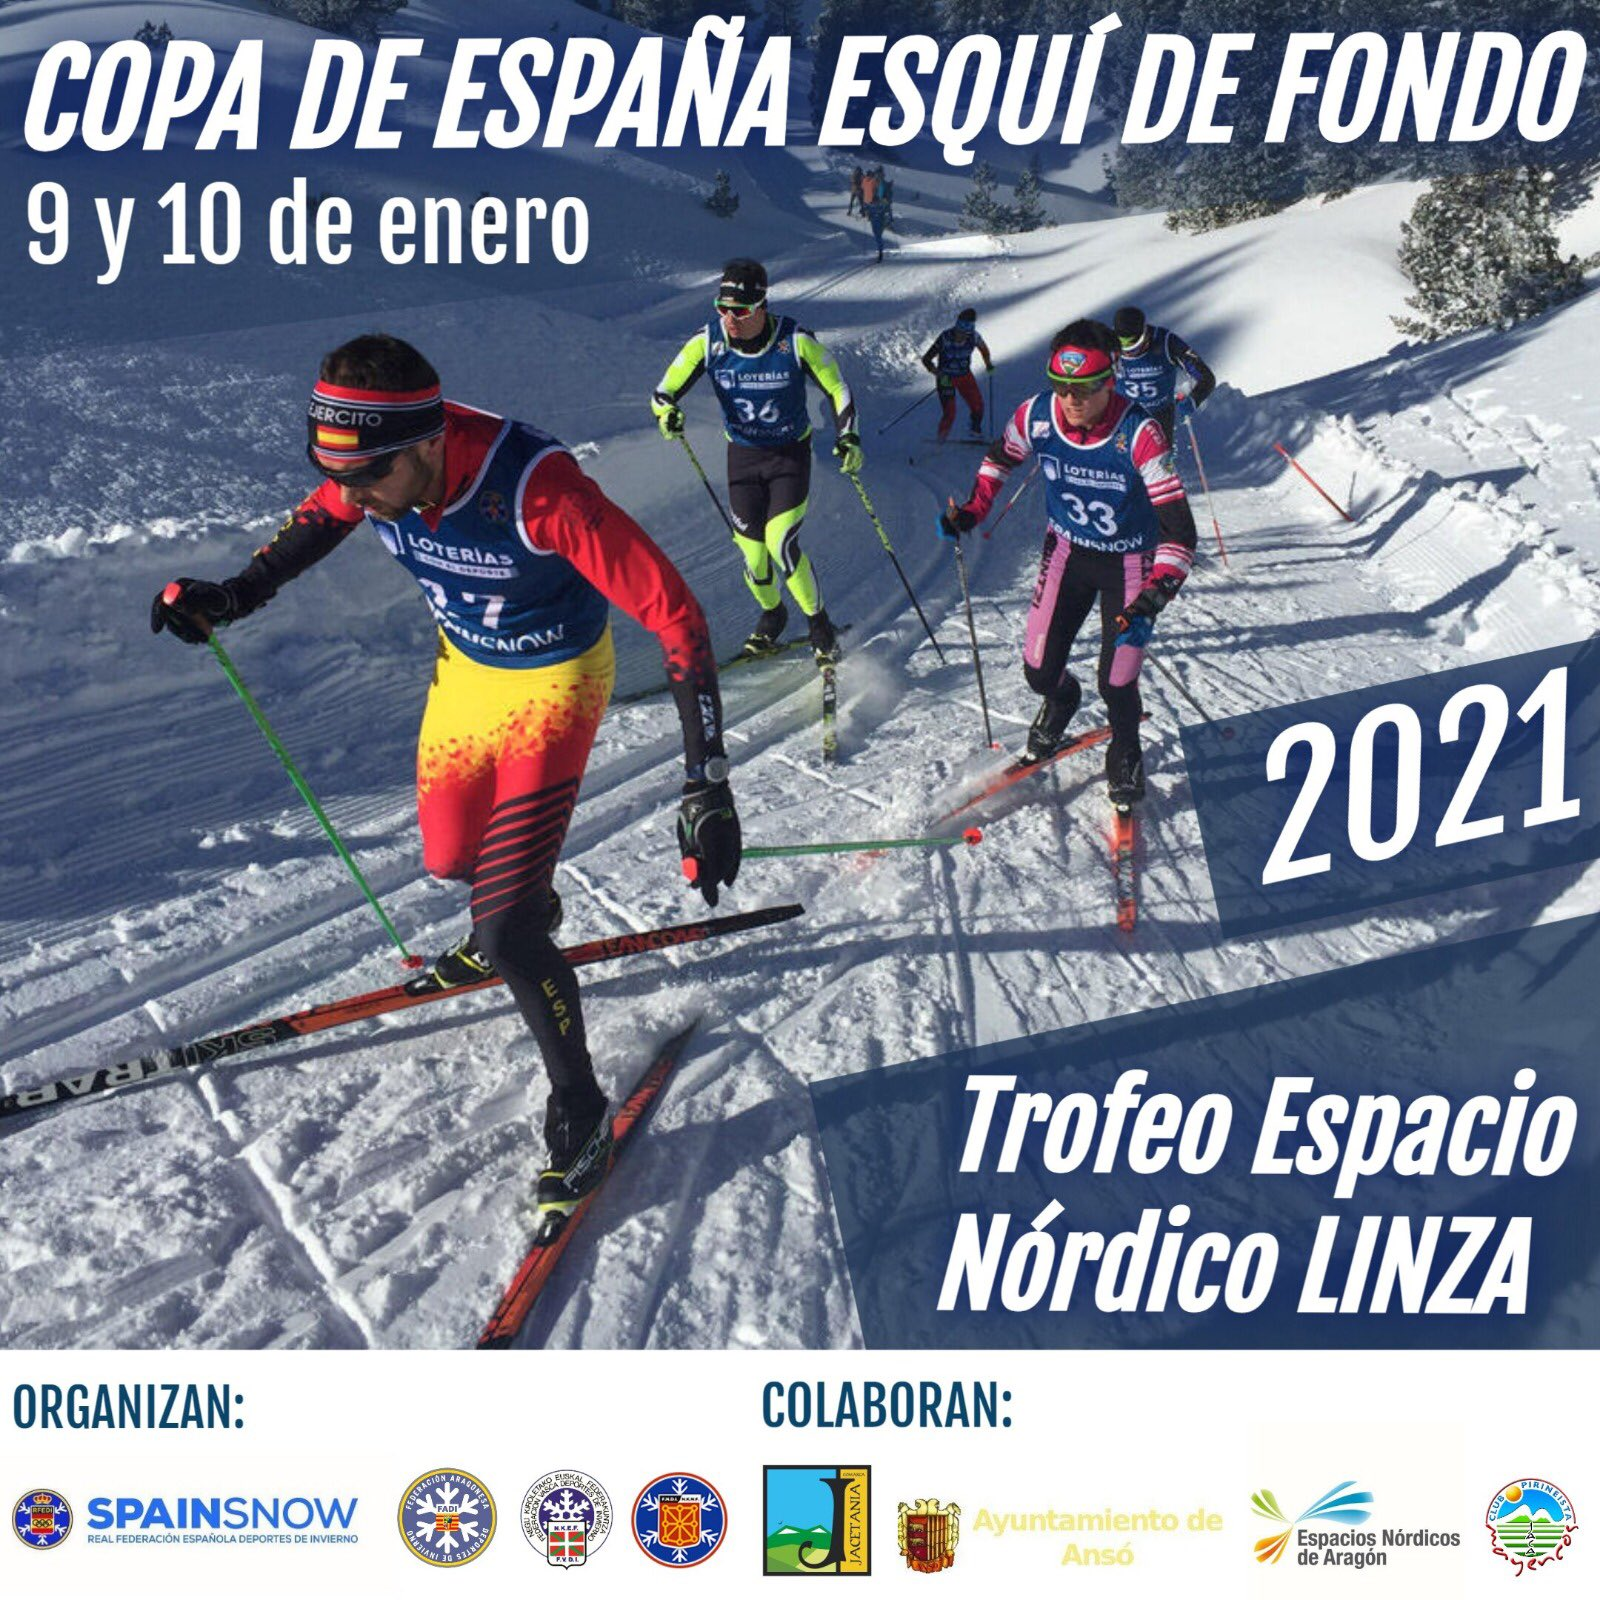 Copa de España de Esquí de Fondo FIS. Trofeo Espacio Nórdico Linza